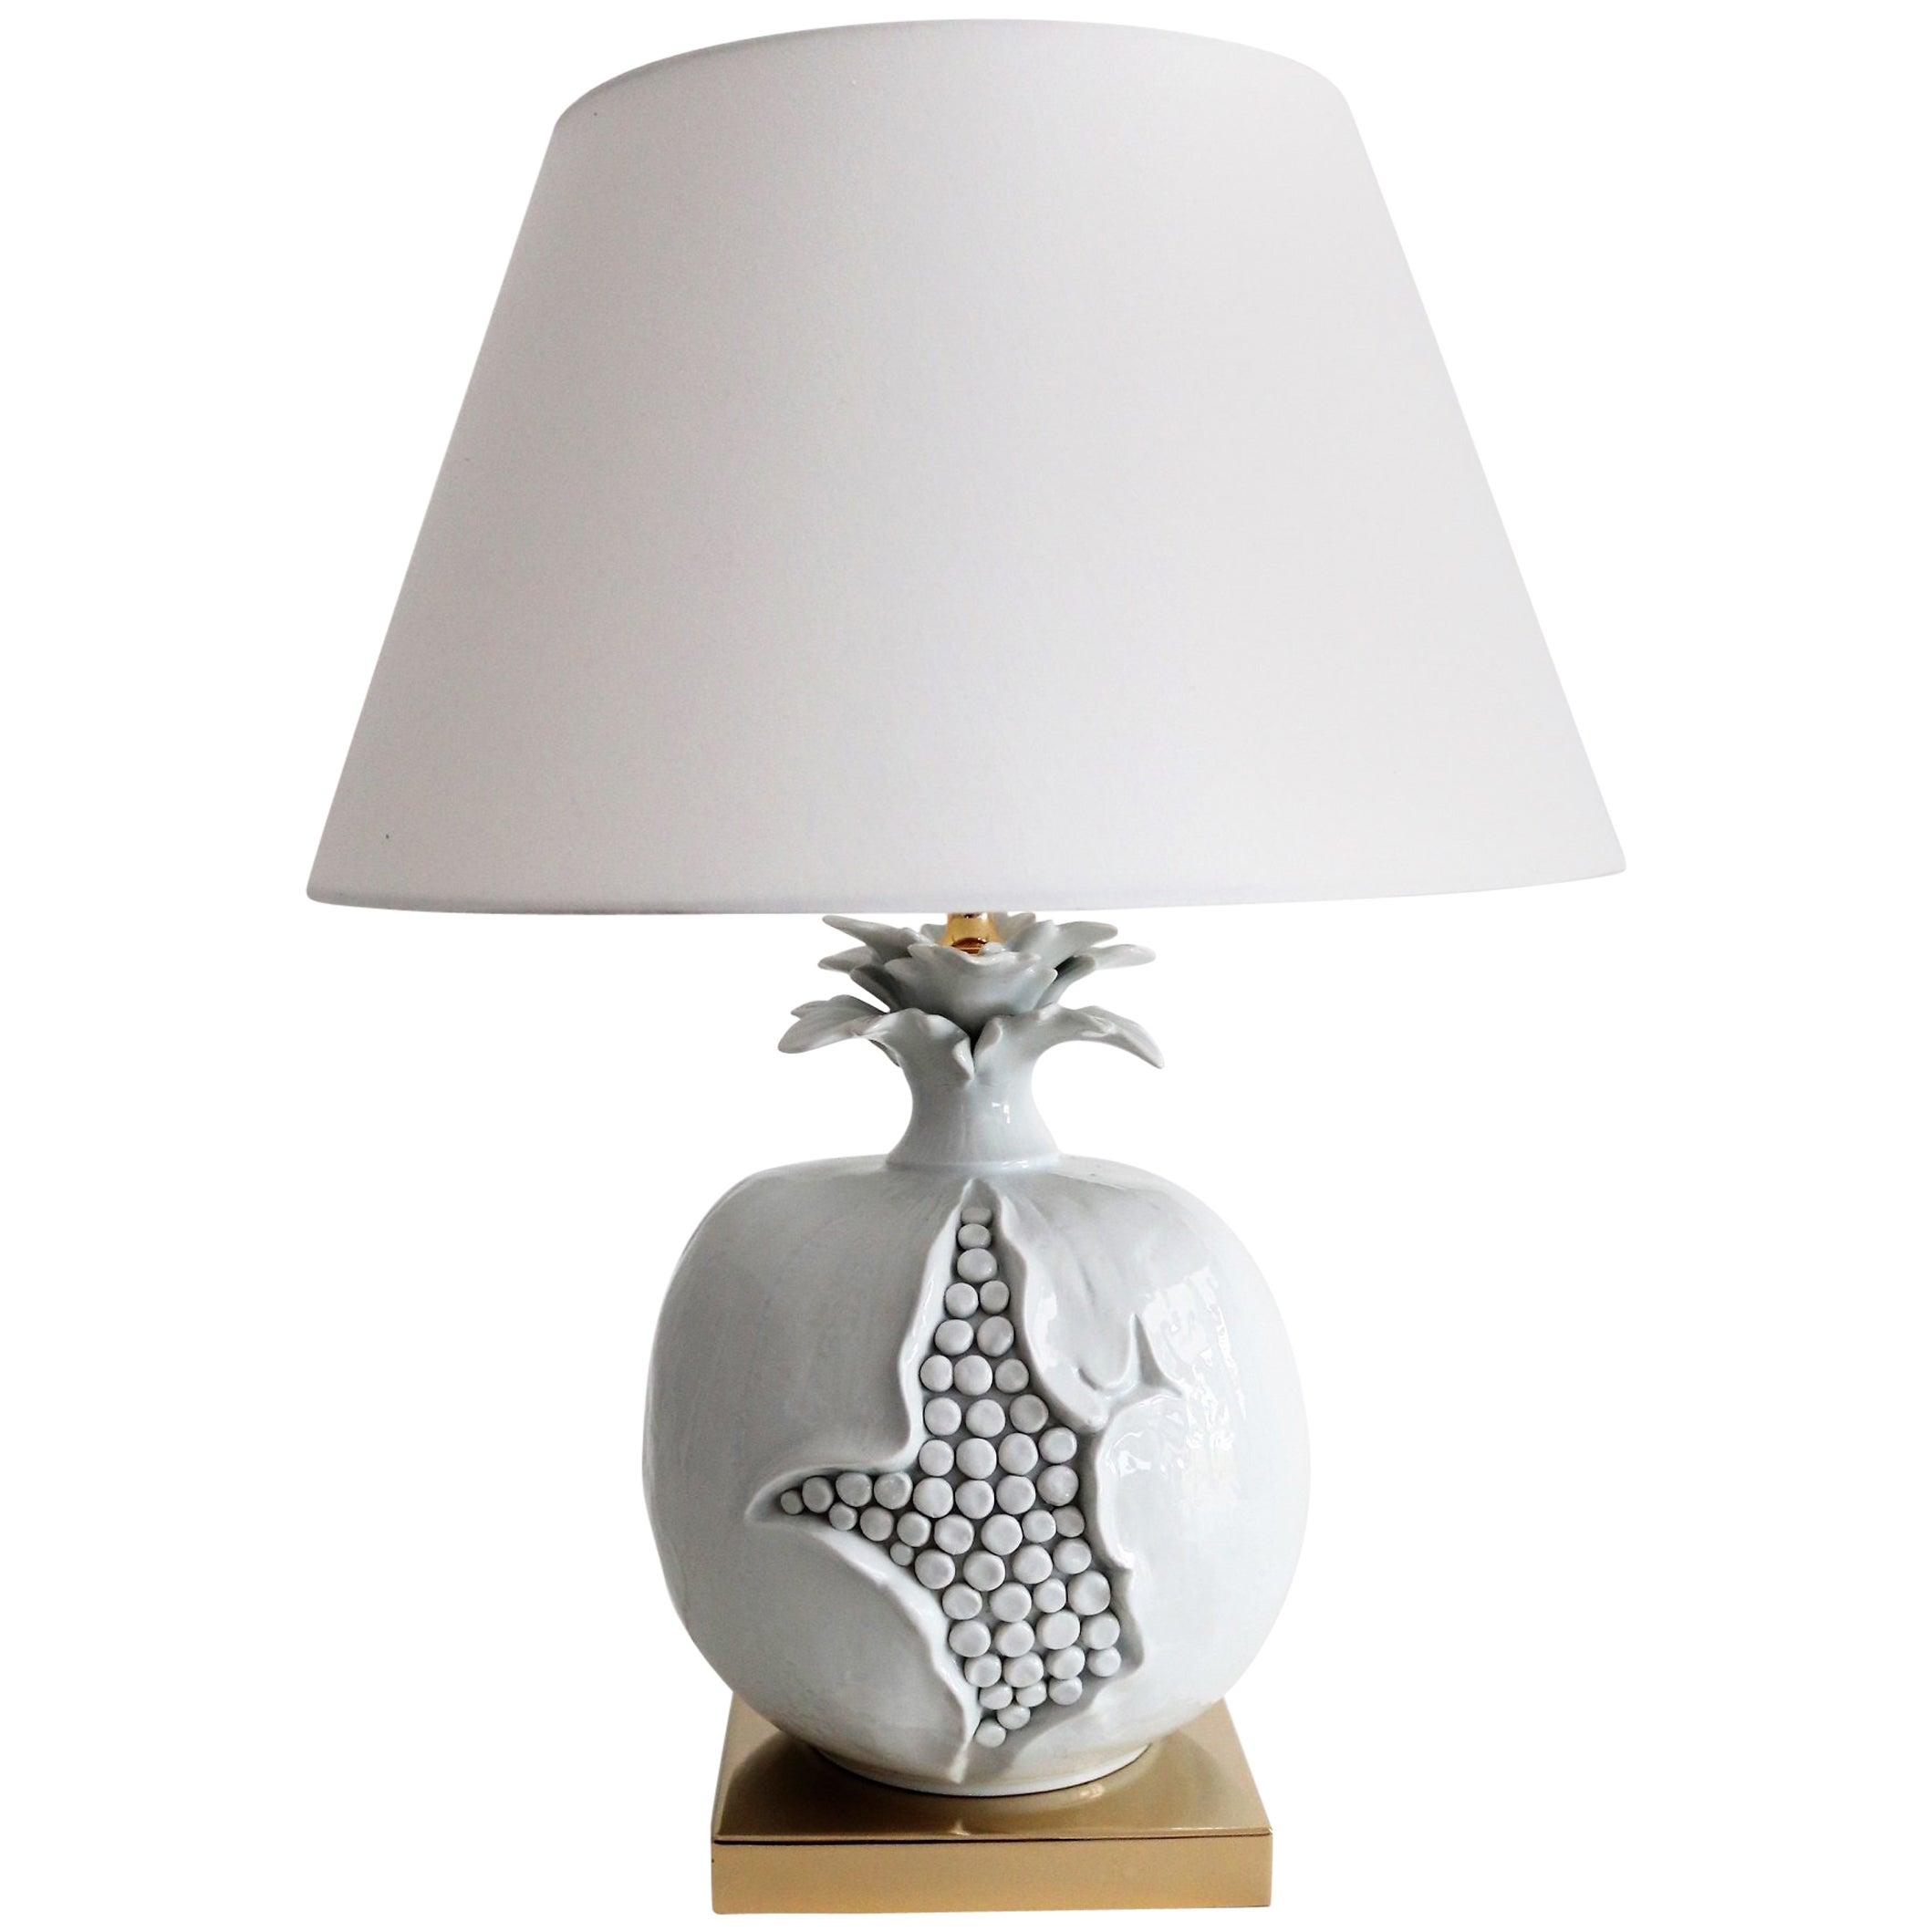 Italian Mid-Century Ceramic and Brass Table Lamp in Pomegranate Shape, 1970s